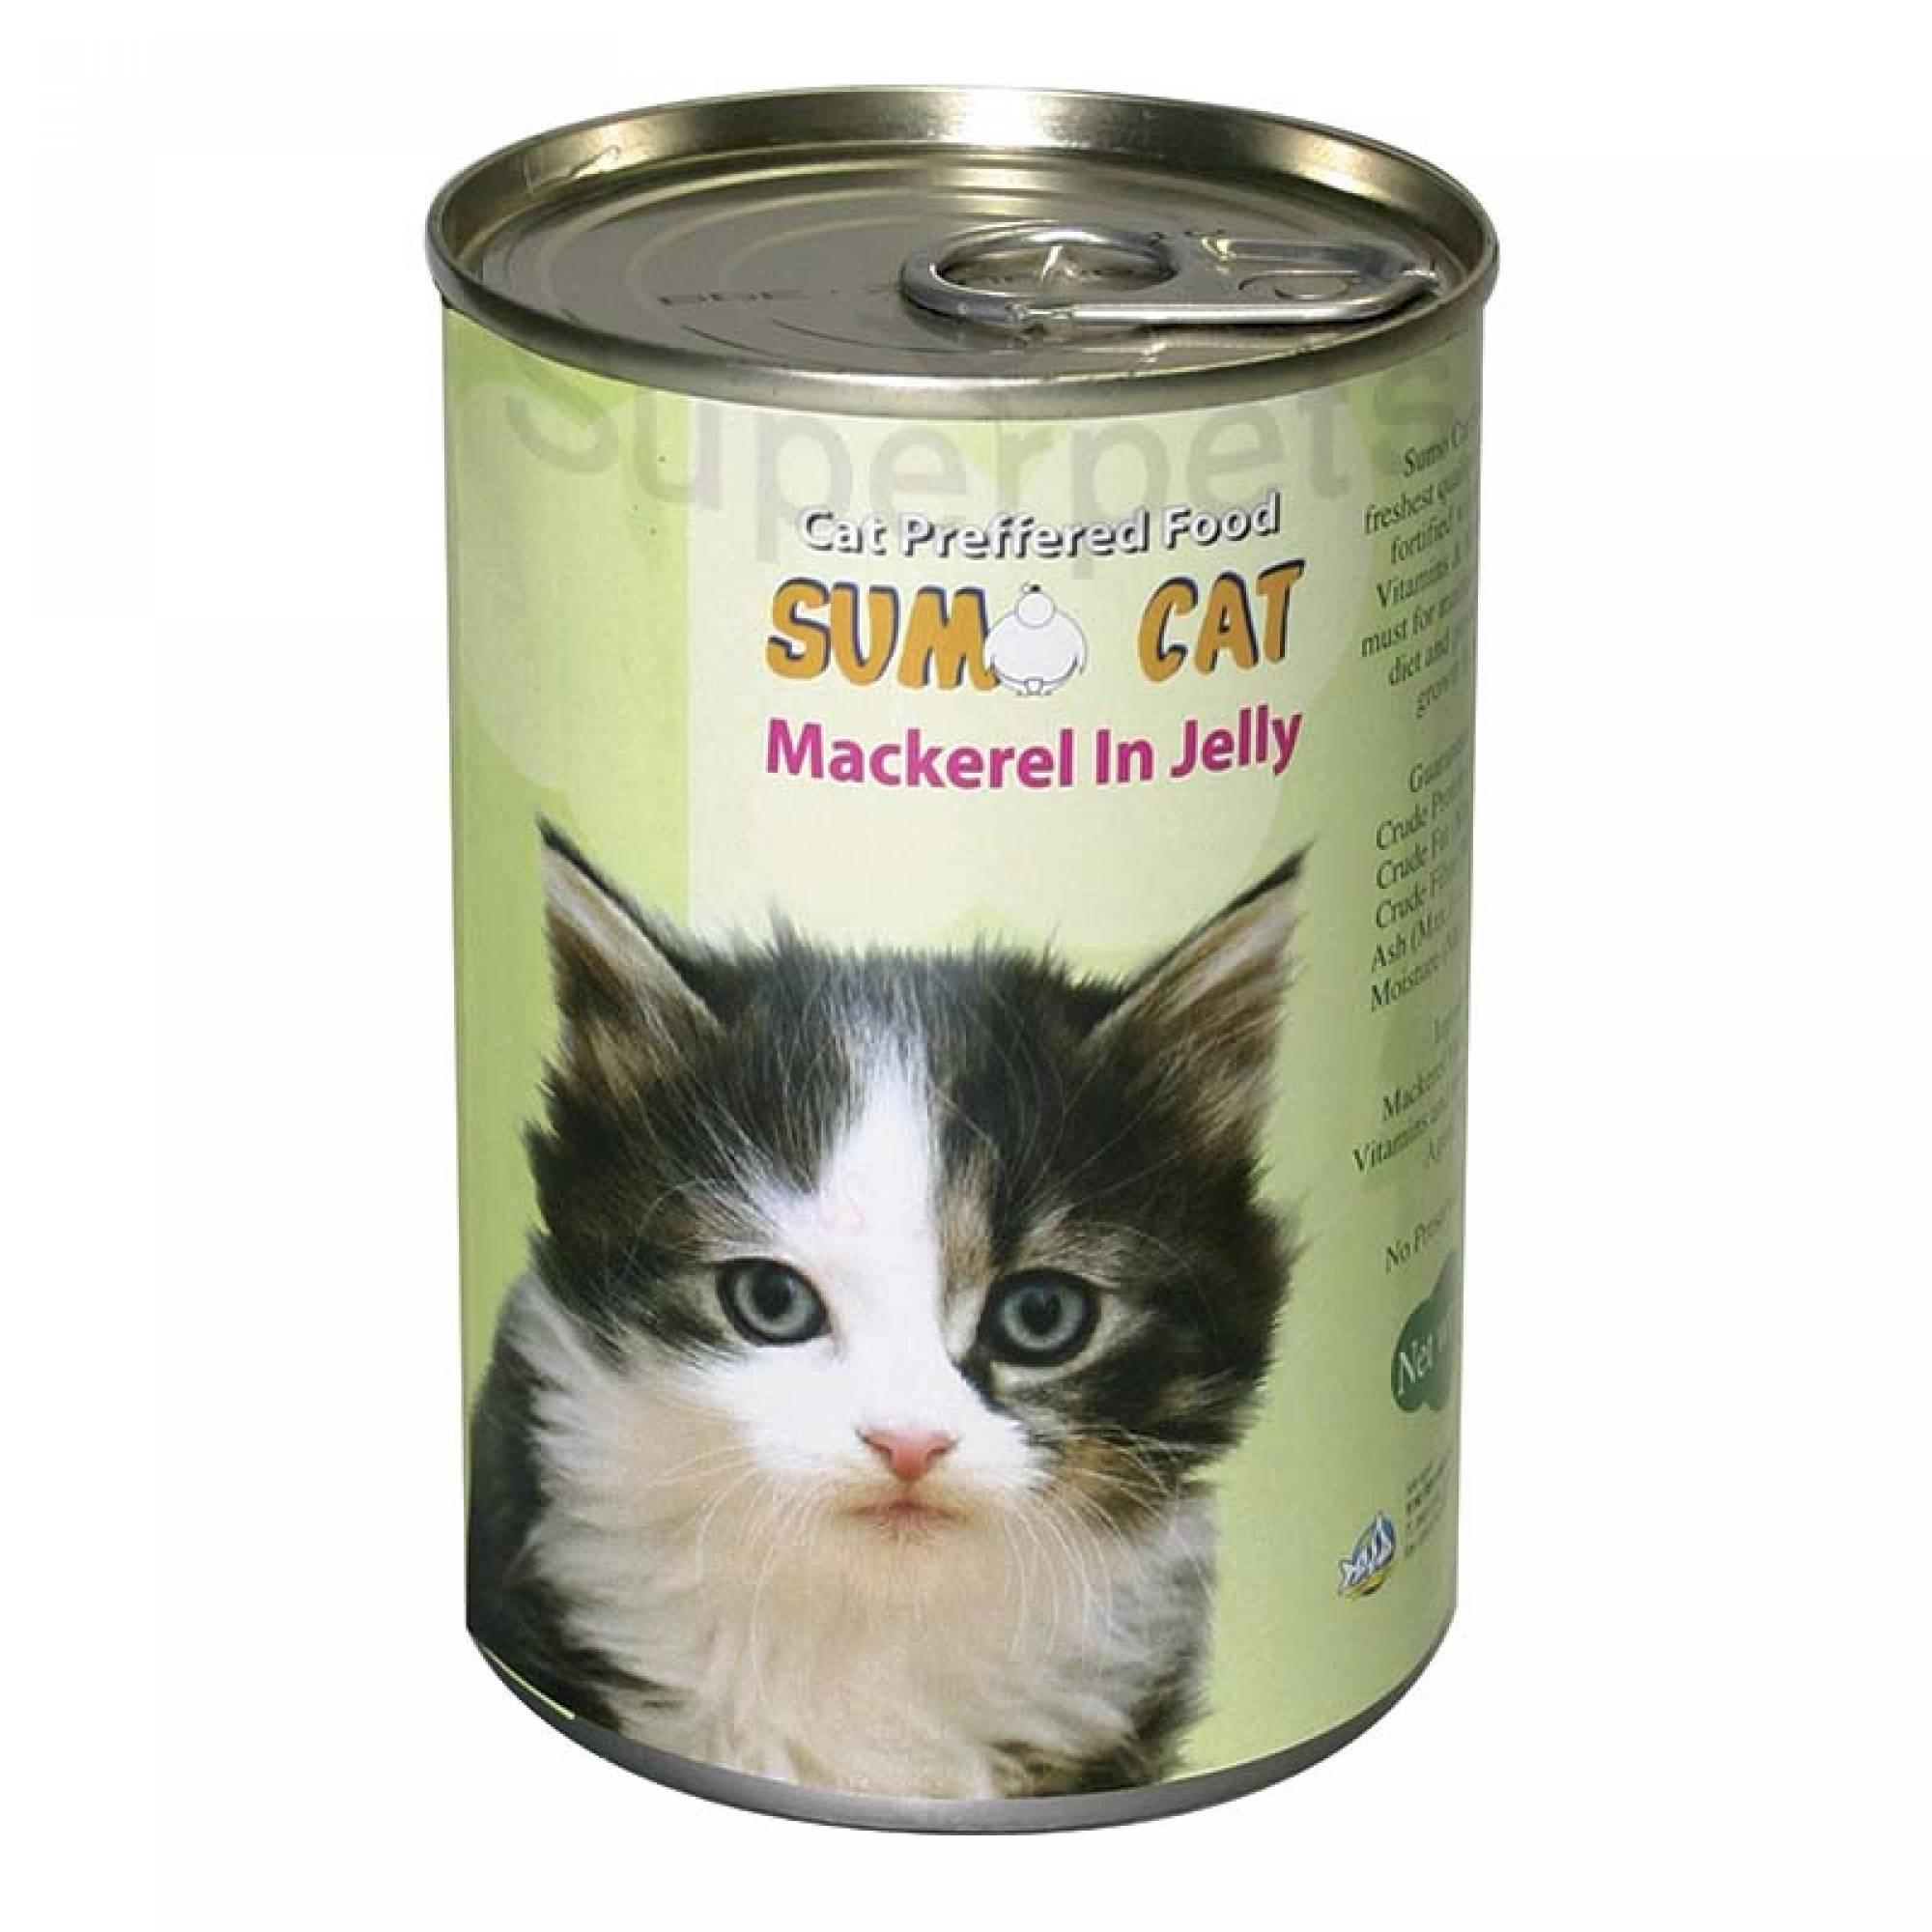 Sumo Cat - Mackerel in Jelly 400g x 24pcs (1 carton)